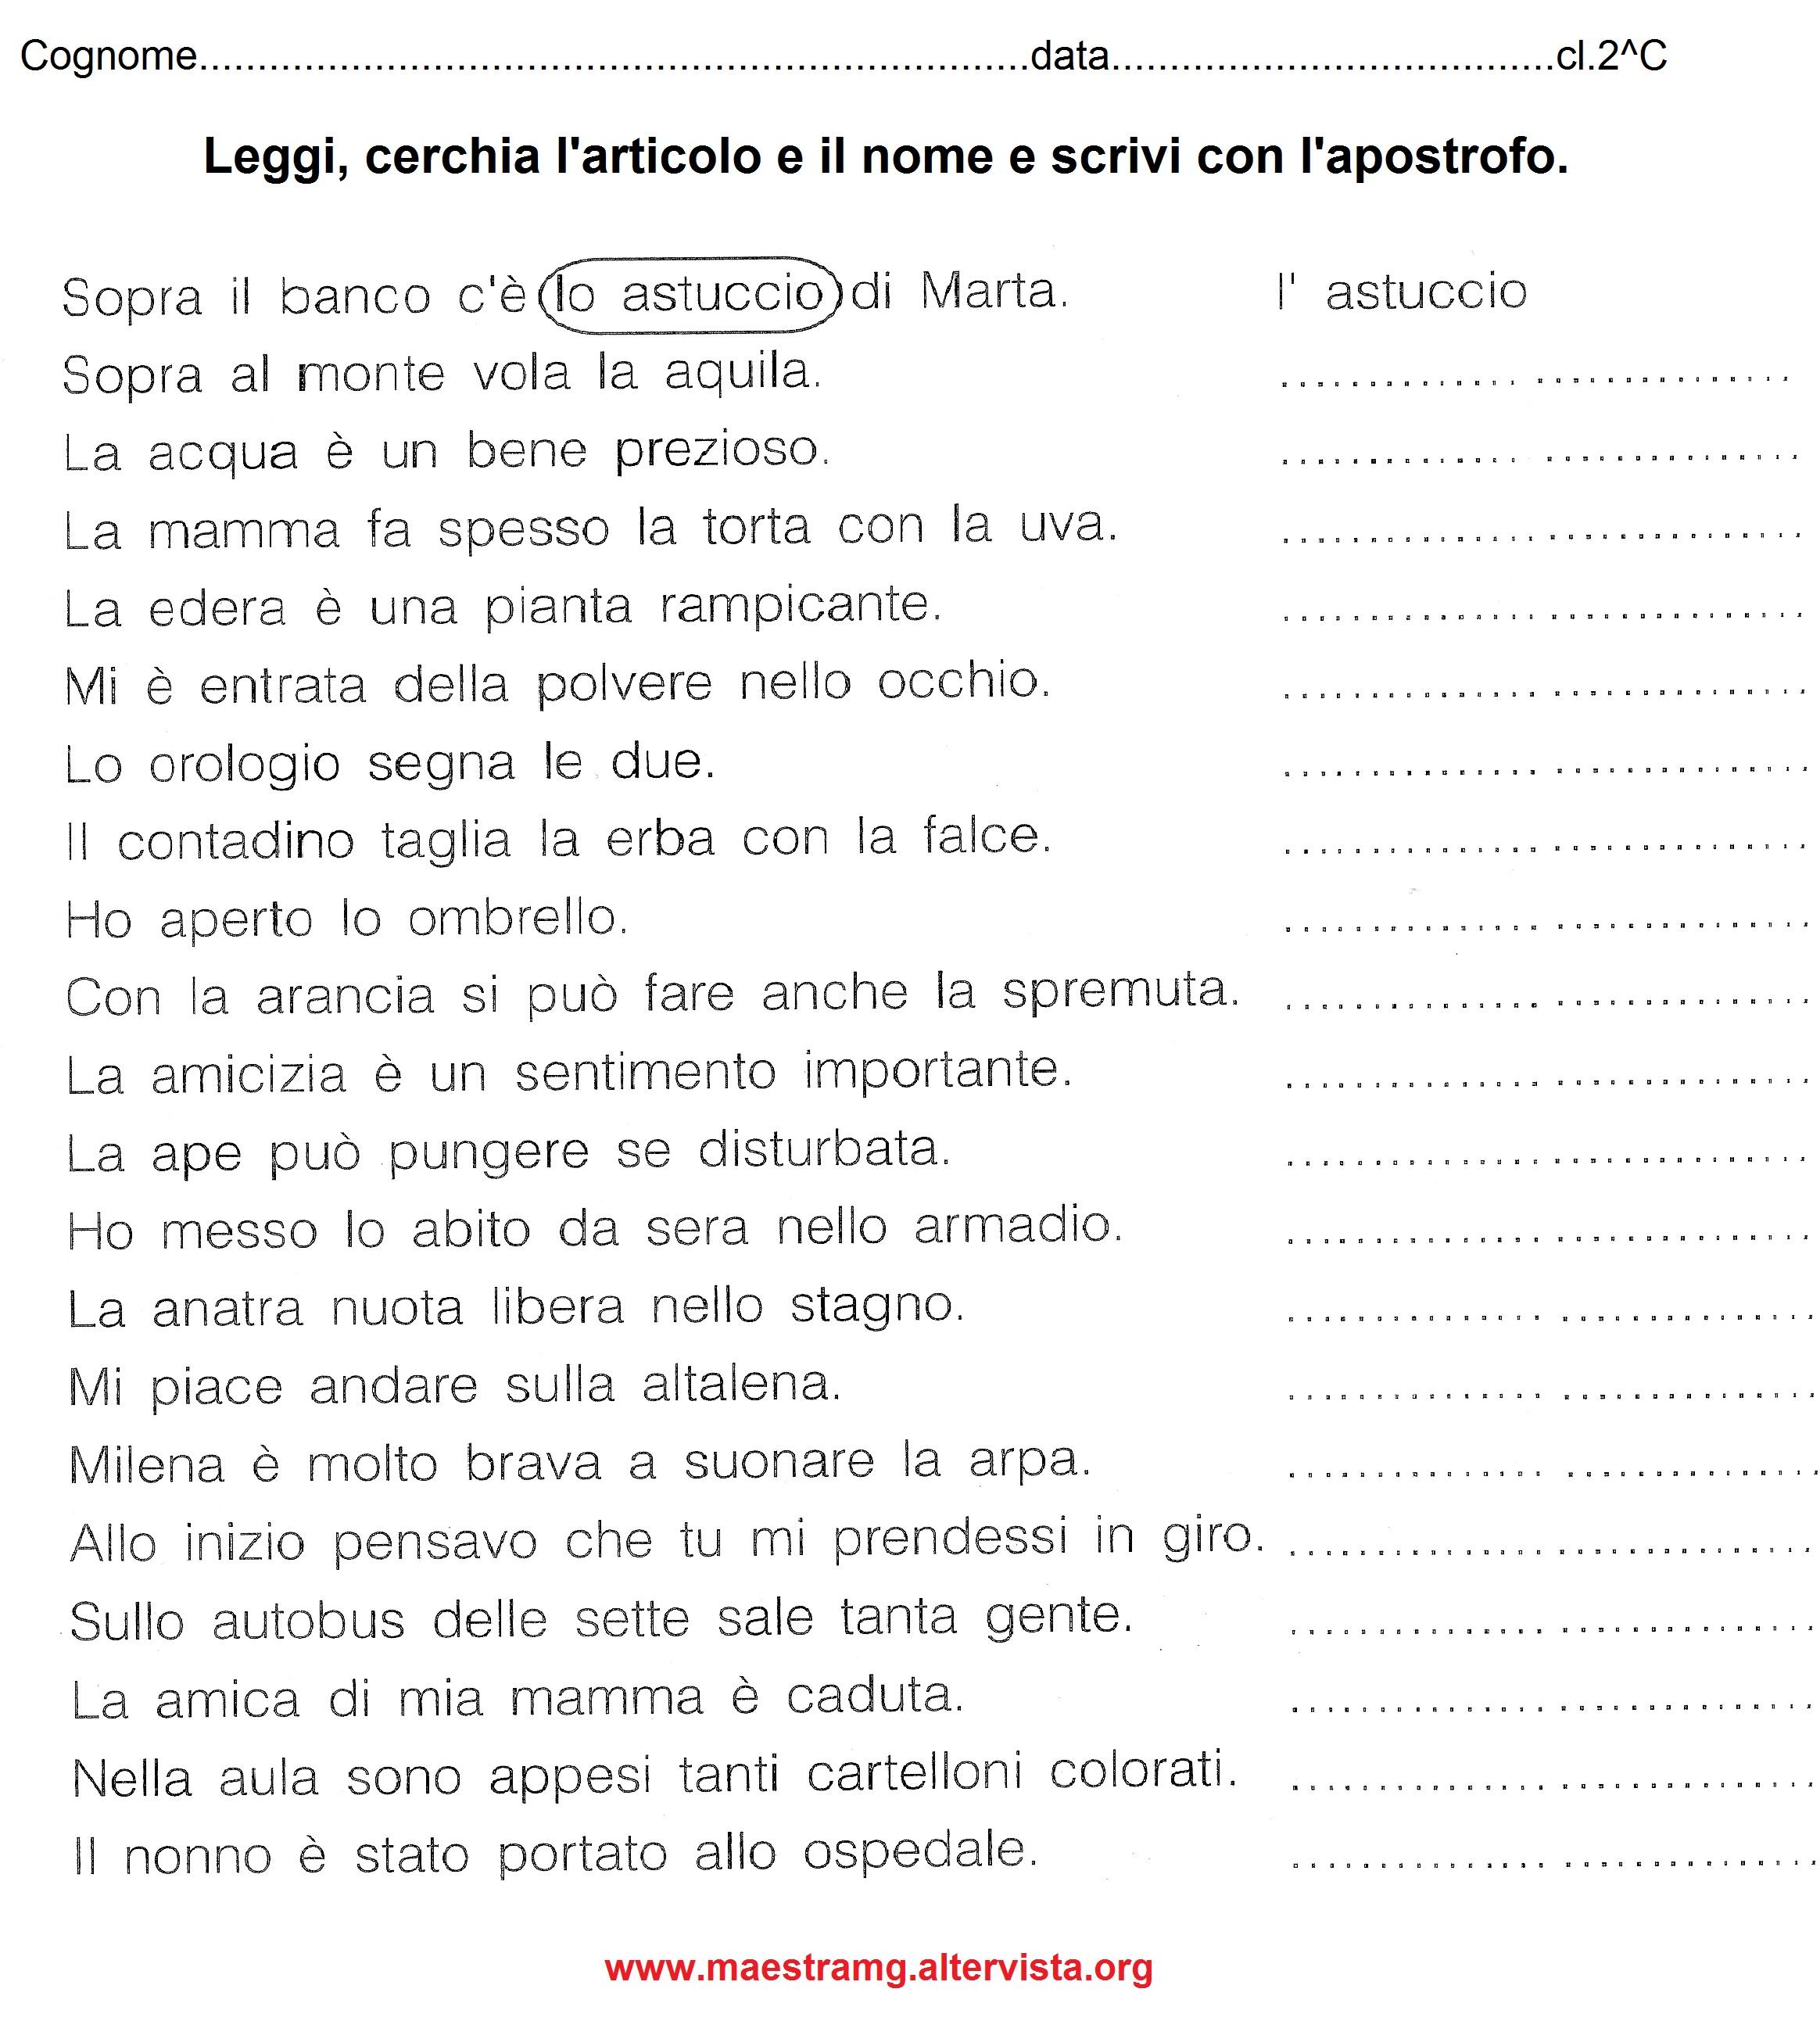 Popolare Seconda classe - LINGUA ITALIANA | MAESTRA MG MAESTRA MG SM49